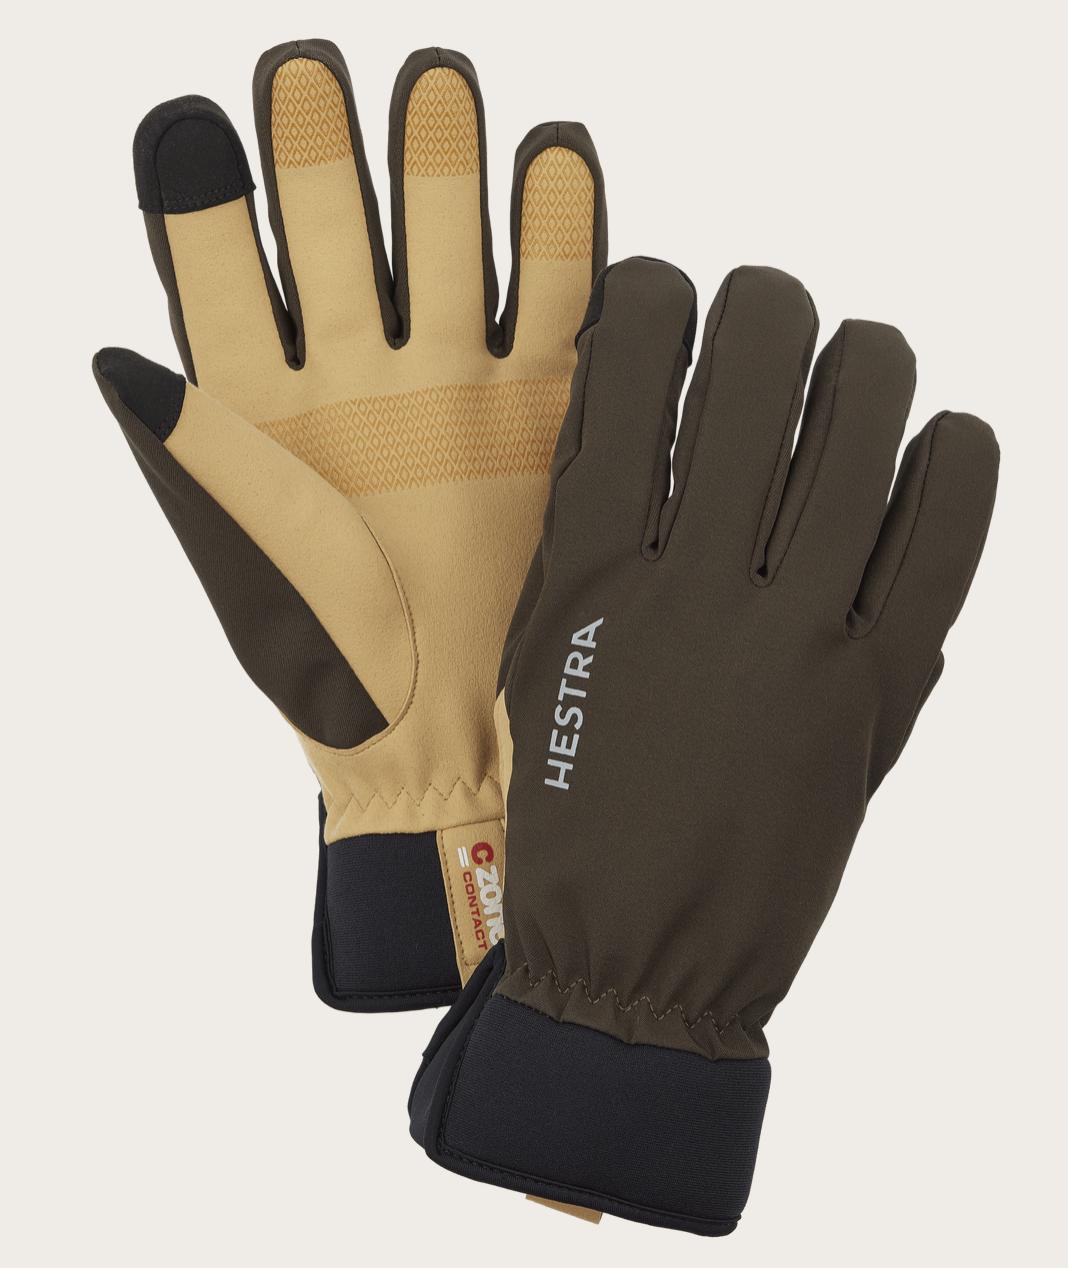 Bilde av Hestra  CZone Contact Glove -5 finger 861 Dark forest